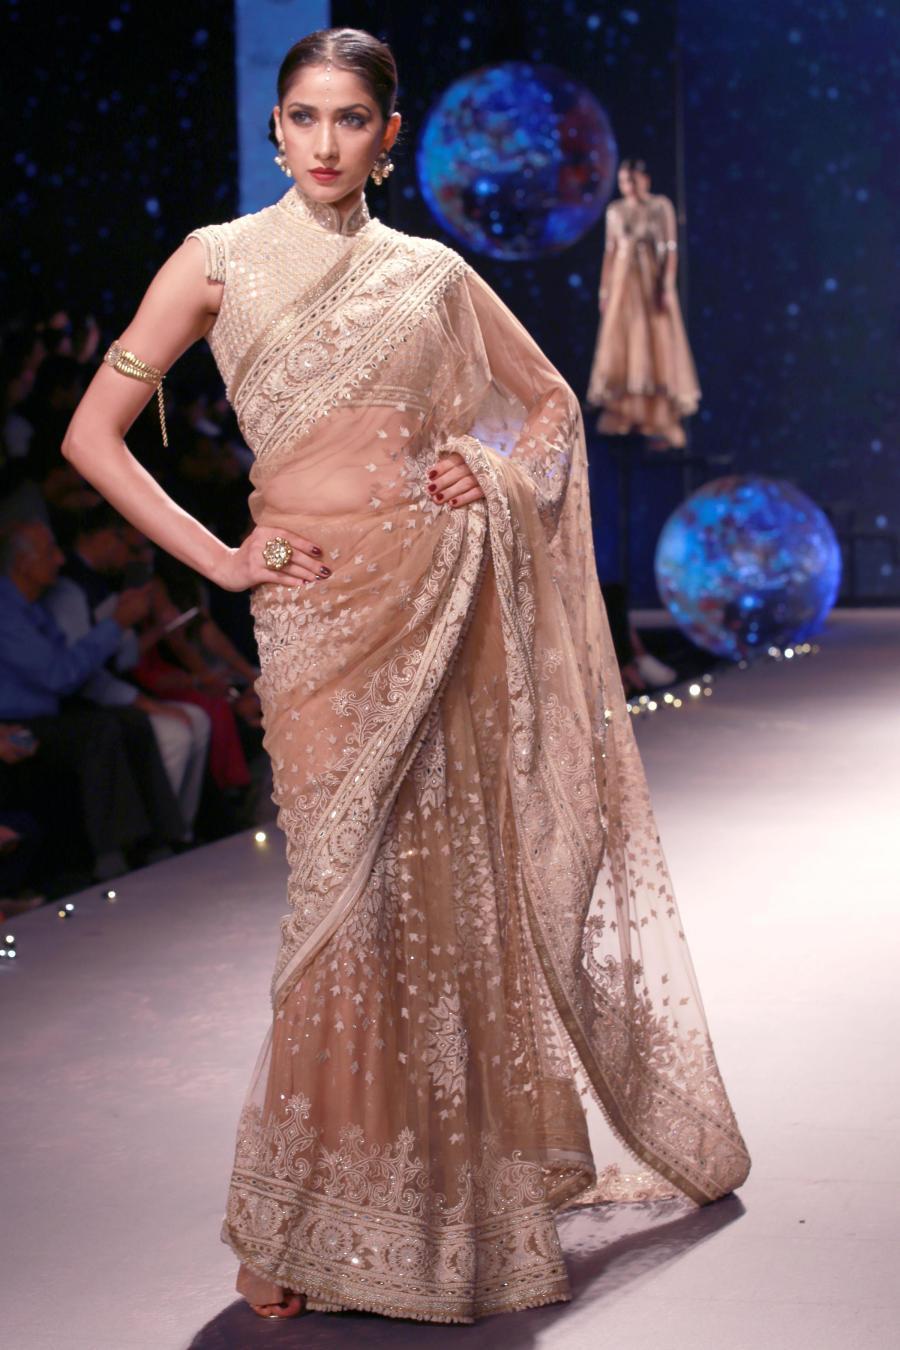 Lisa Haydon Walk at BMW India Bridal Fashion Week 2015-04